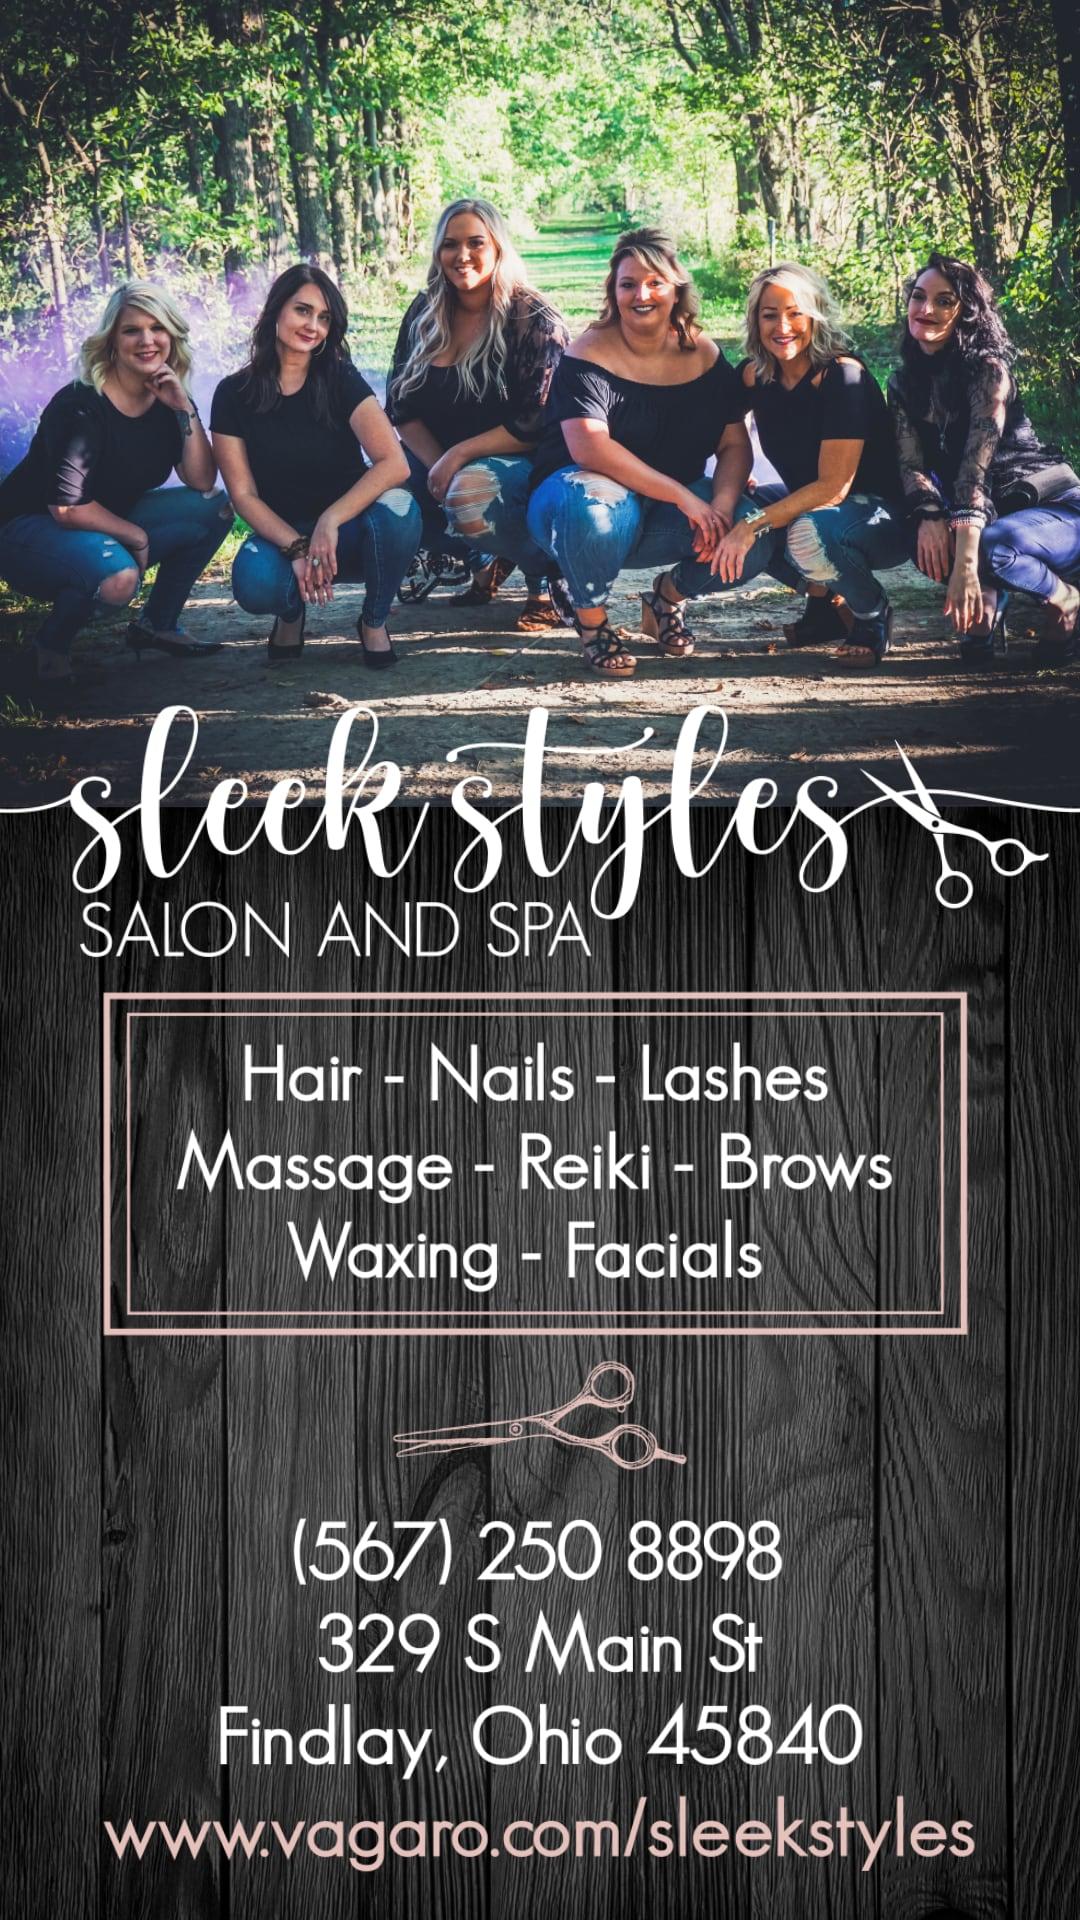 Sleek Styles Ad